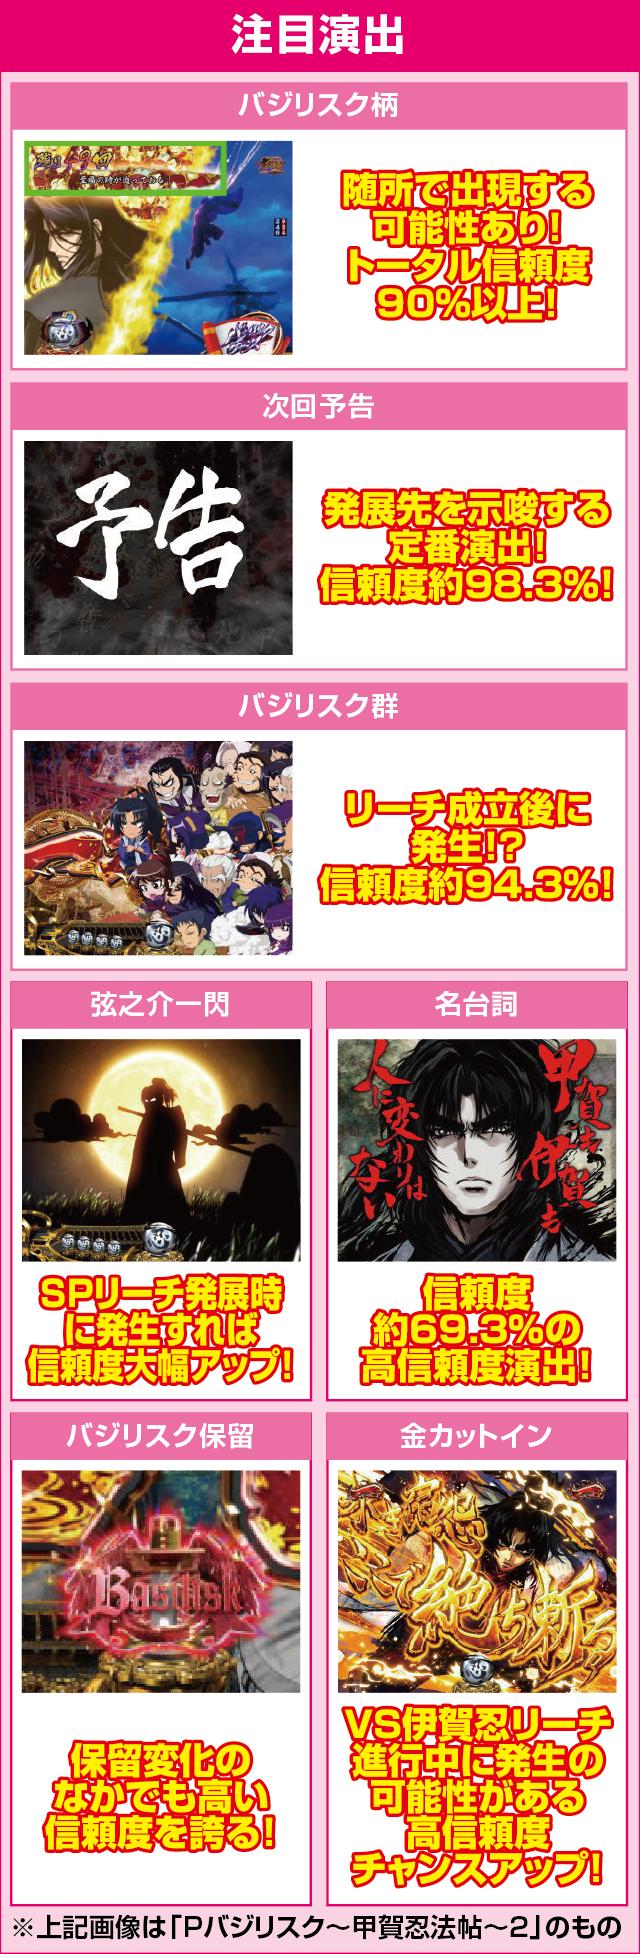 Pバジリスク~甲賀忍法帖~2 朧の章のピックアップポイント